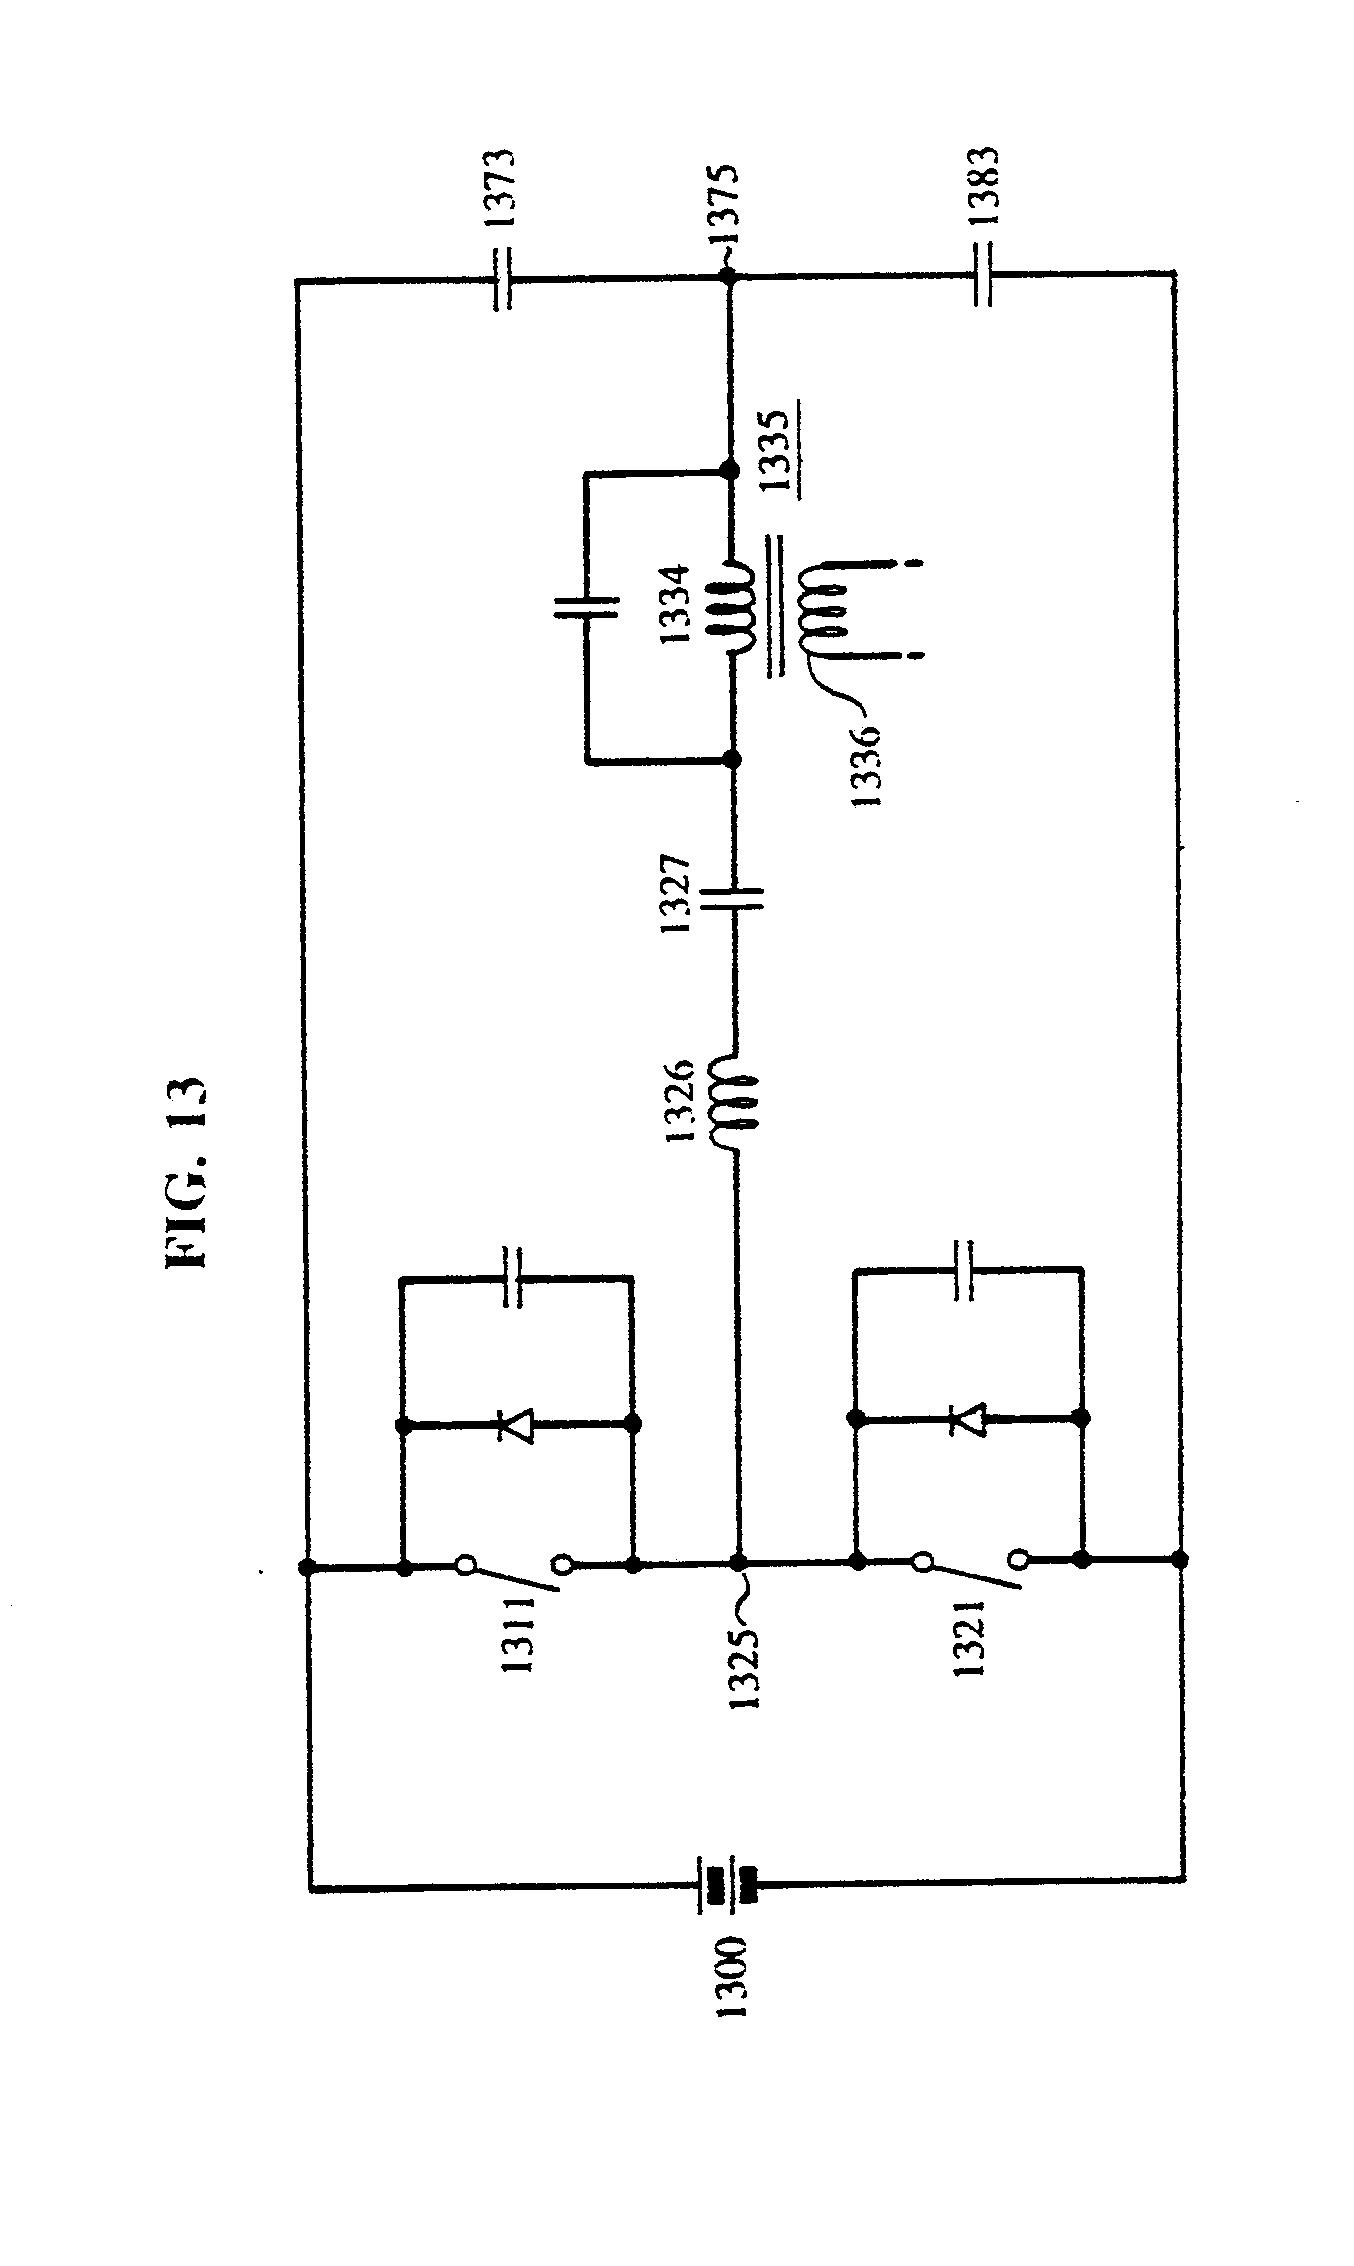 patent ep0343855a2